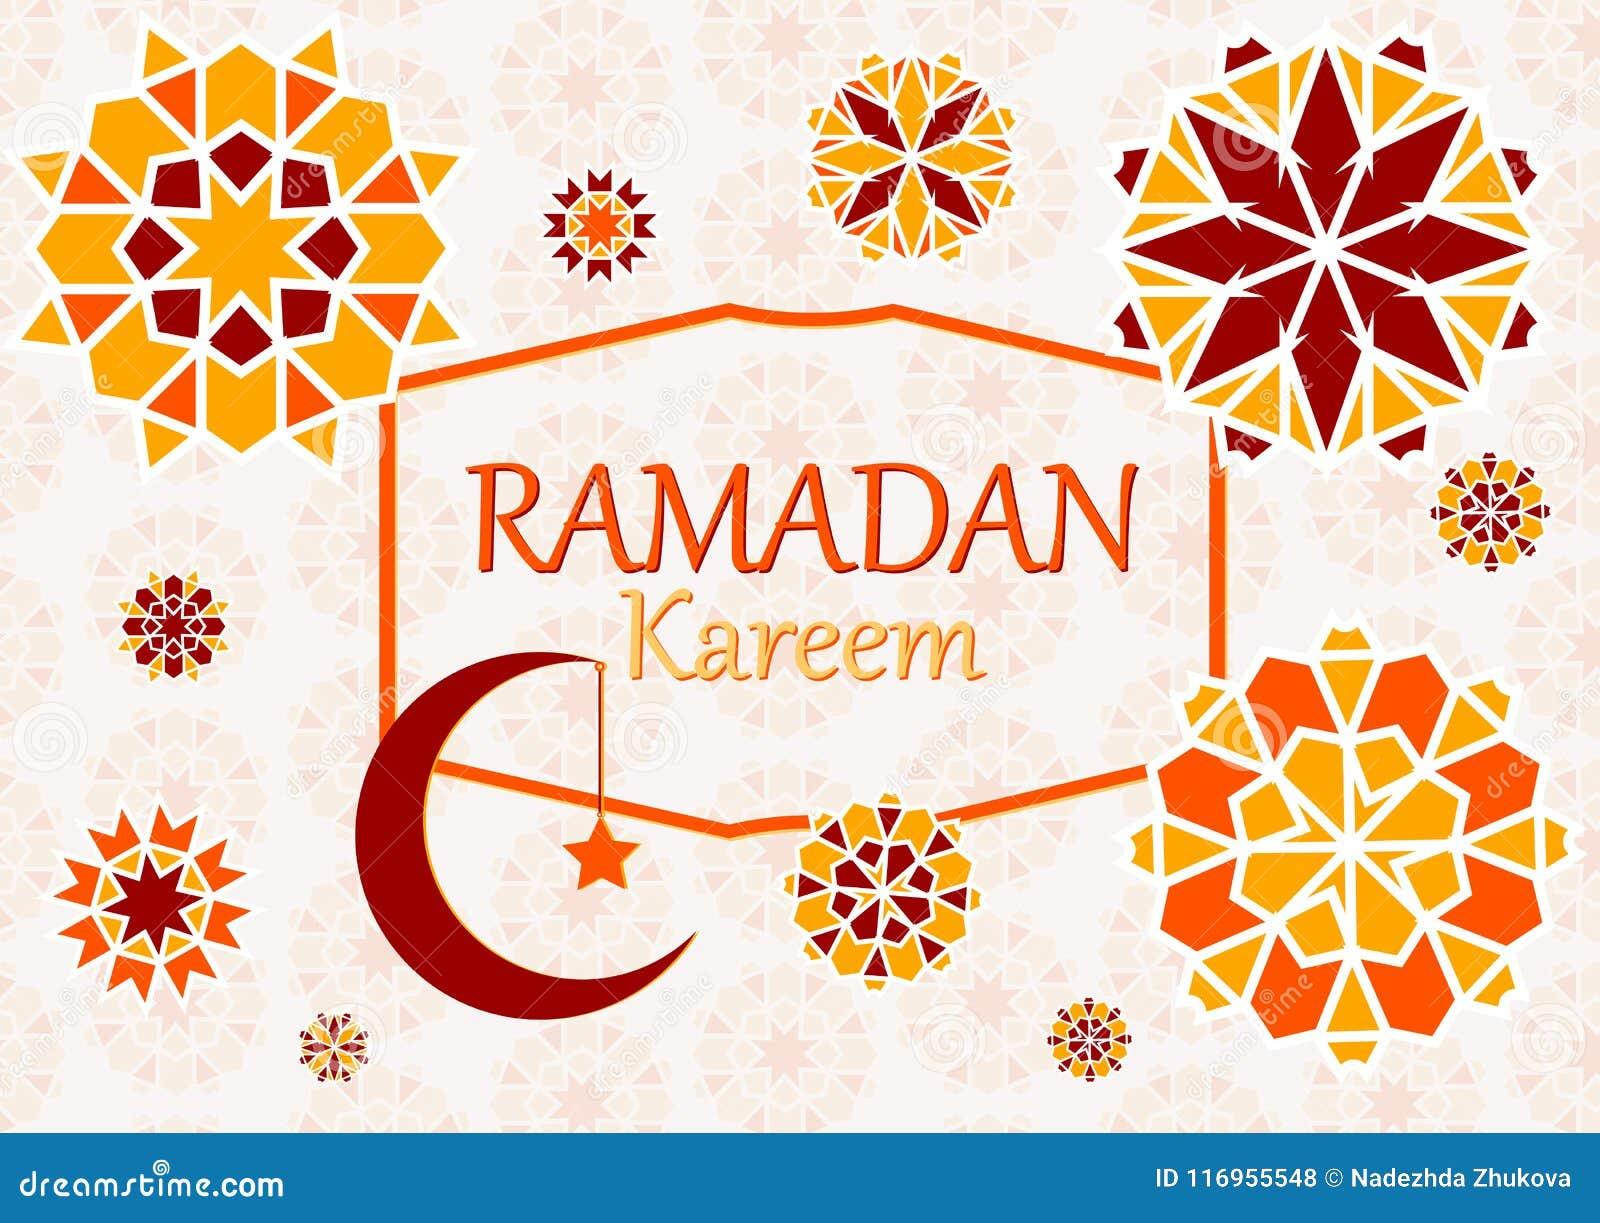 Vector Illustration des Textes, Aufschrift Ramadan Kareem-Fahne,